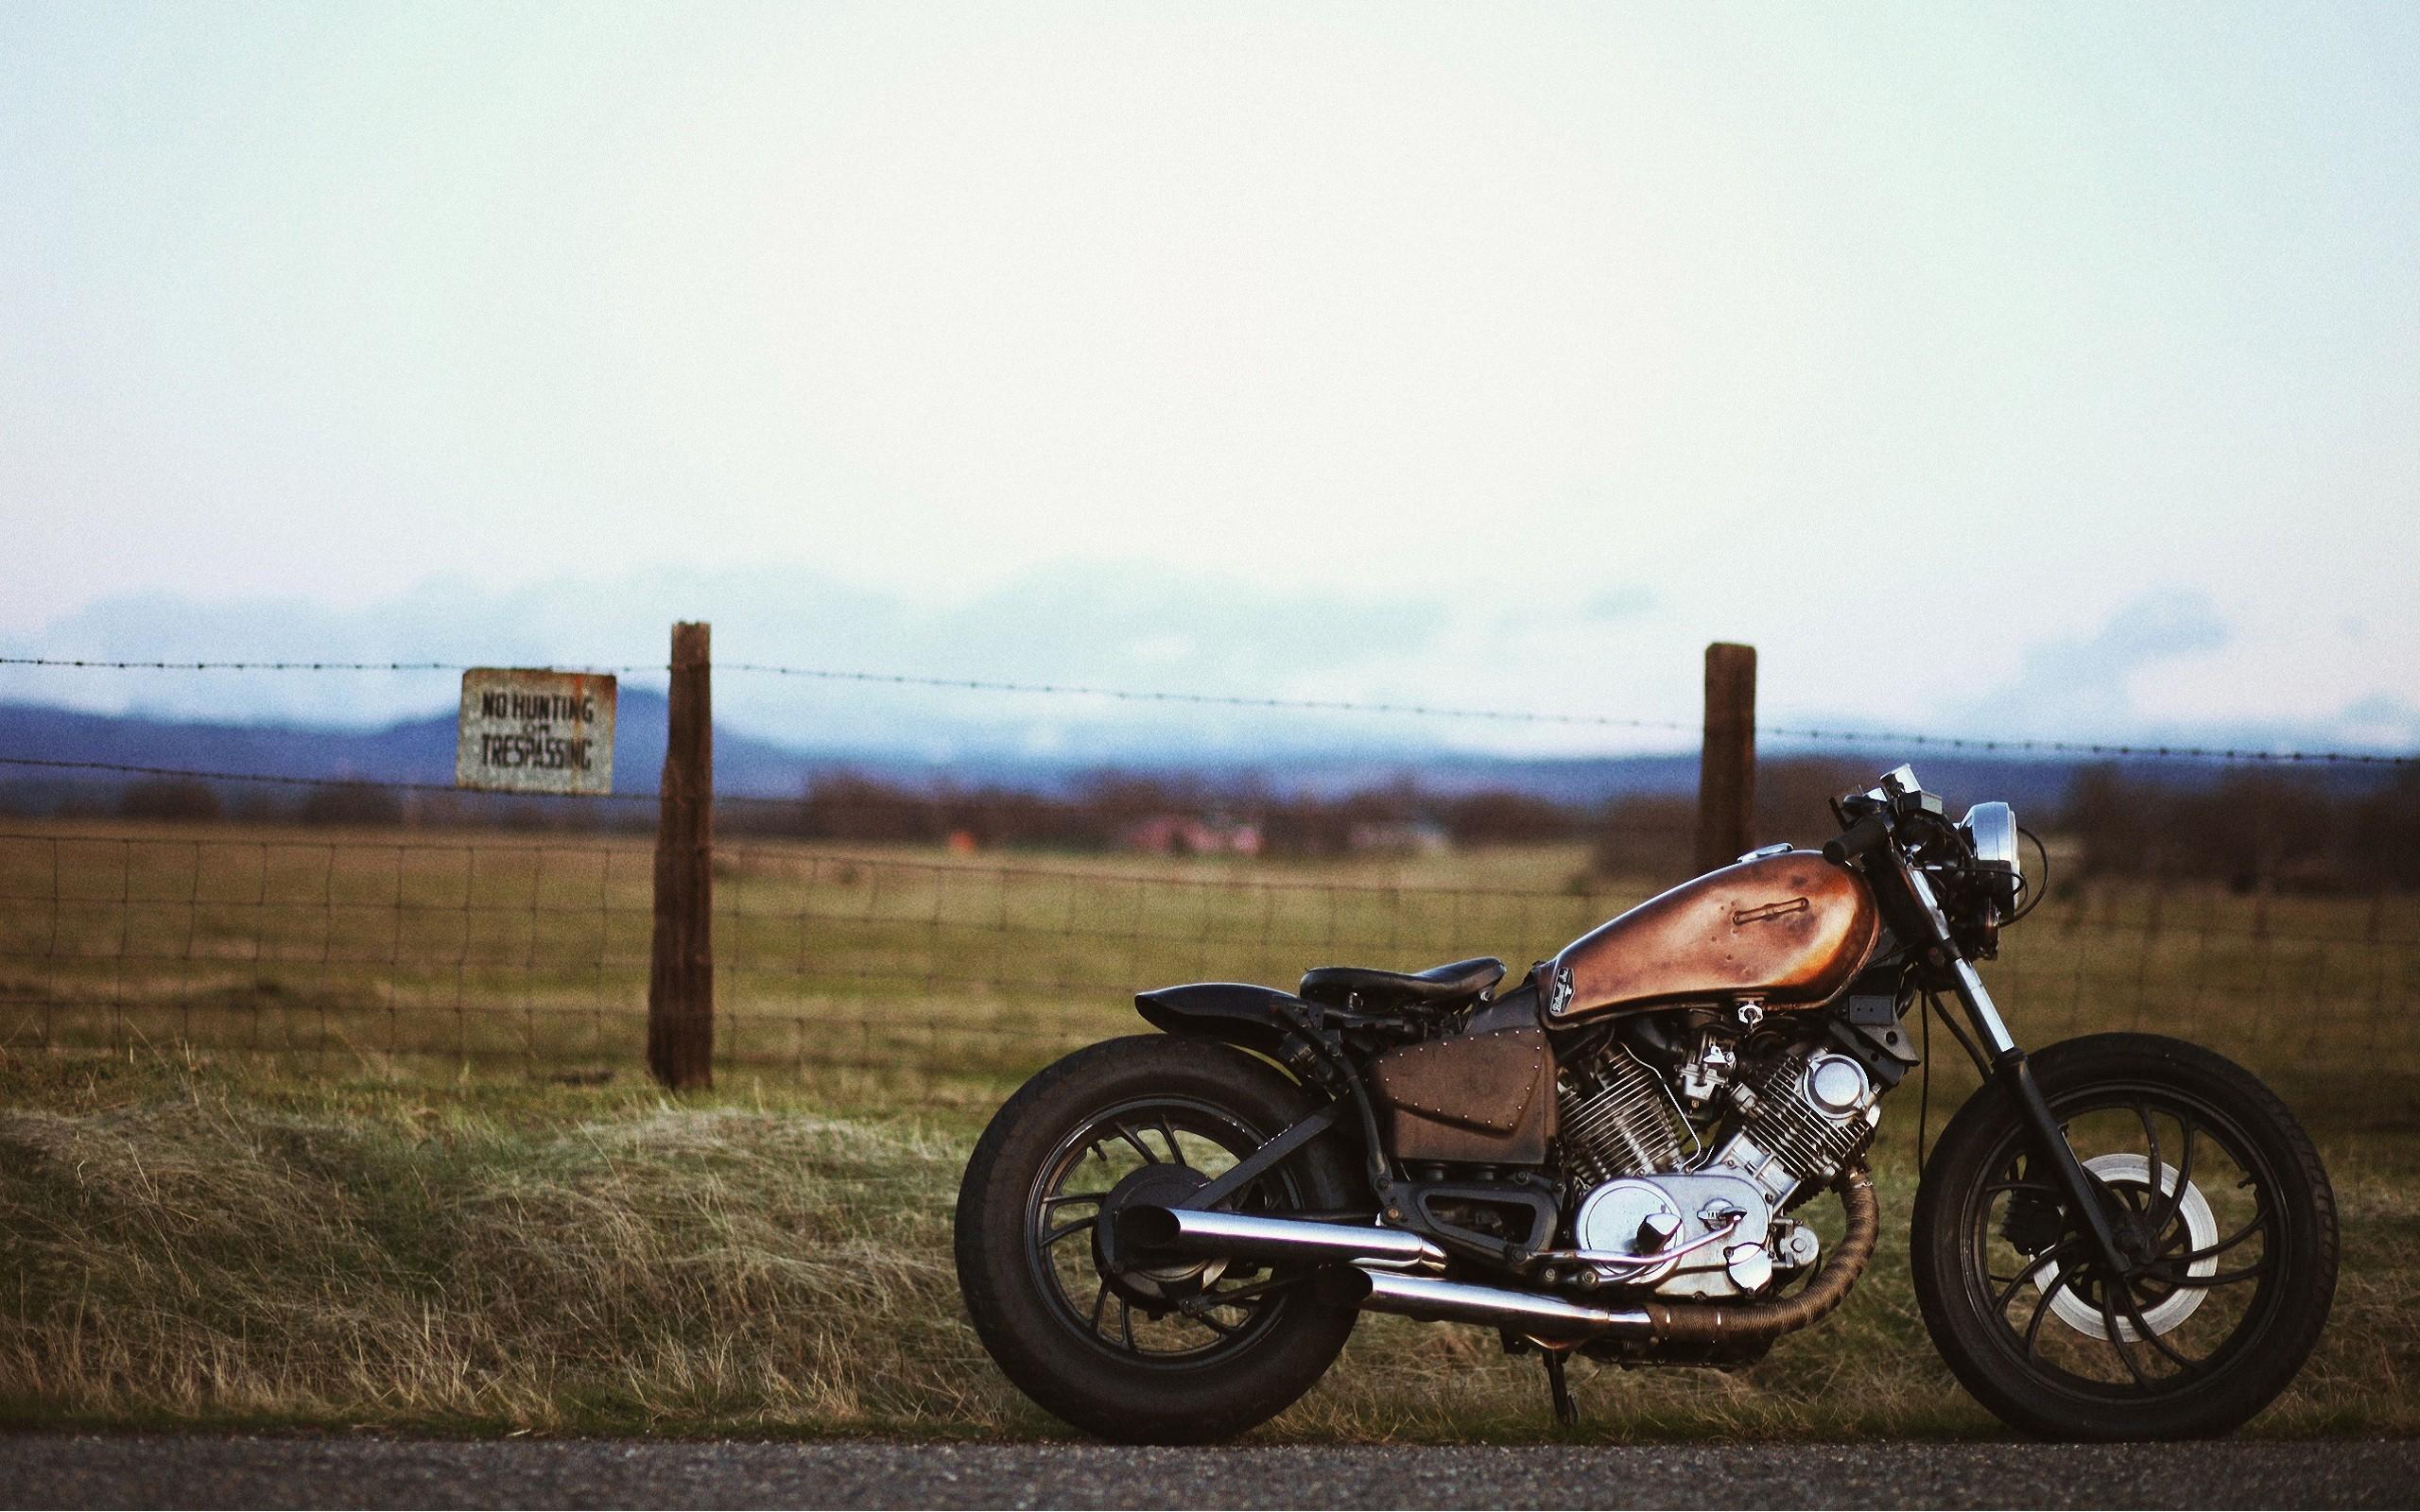 750 bobber harley wallpaper background 2560x1600